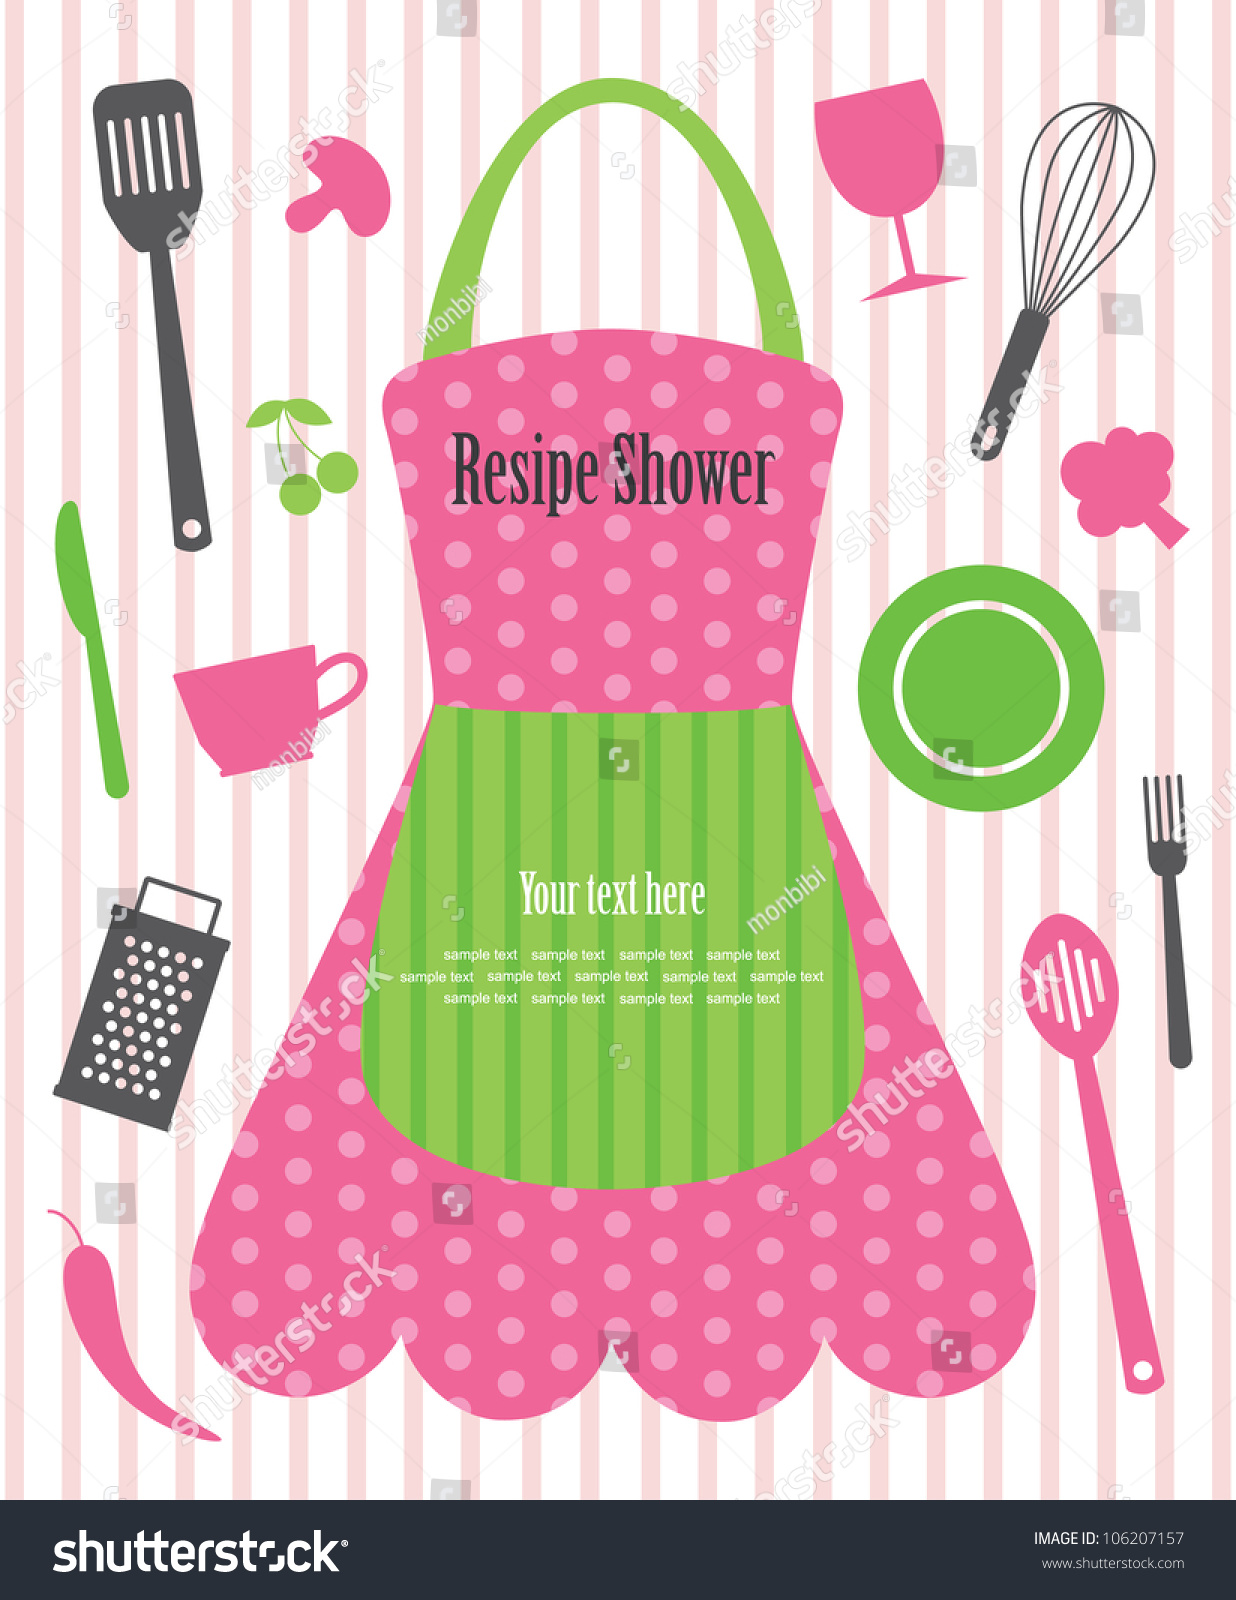 Kitchen Shower Kitchen Shower Vector Illustration Stock Vector 106207157